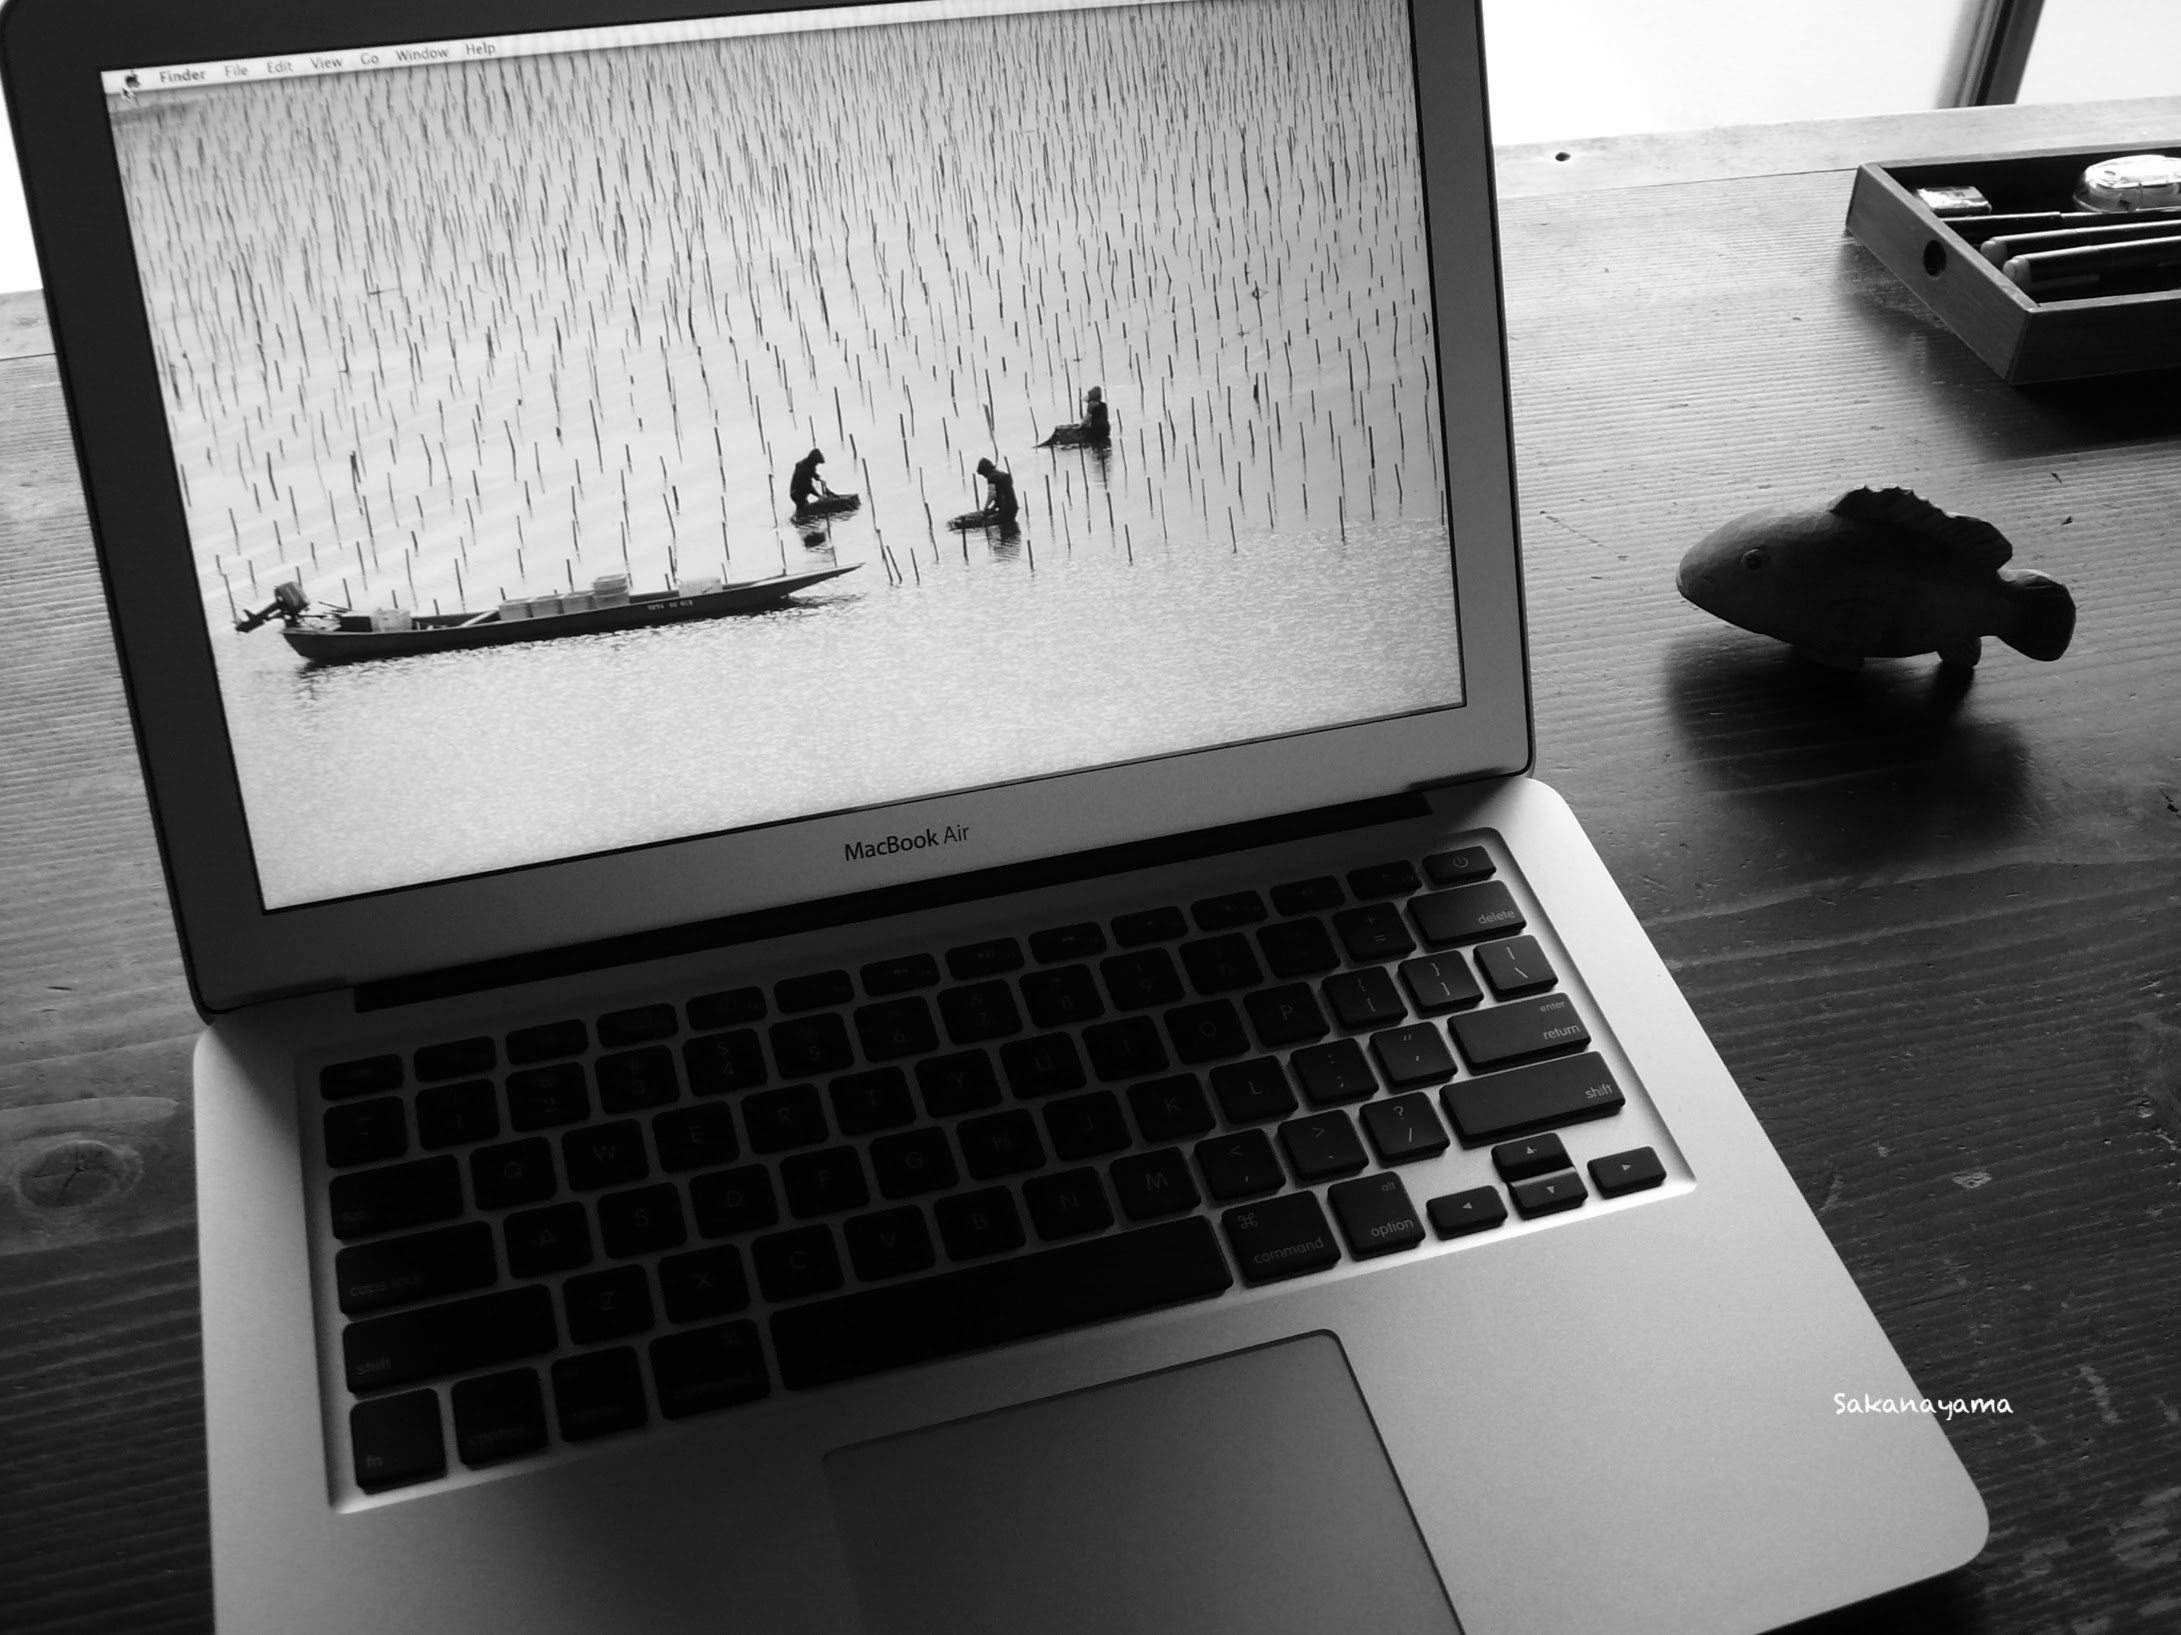 MacBook Air Late2010